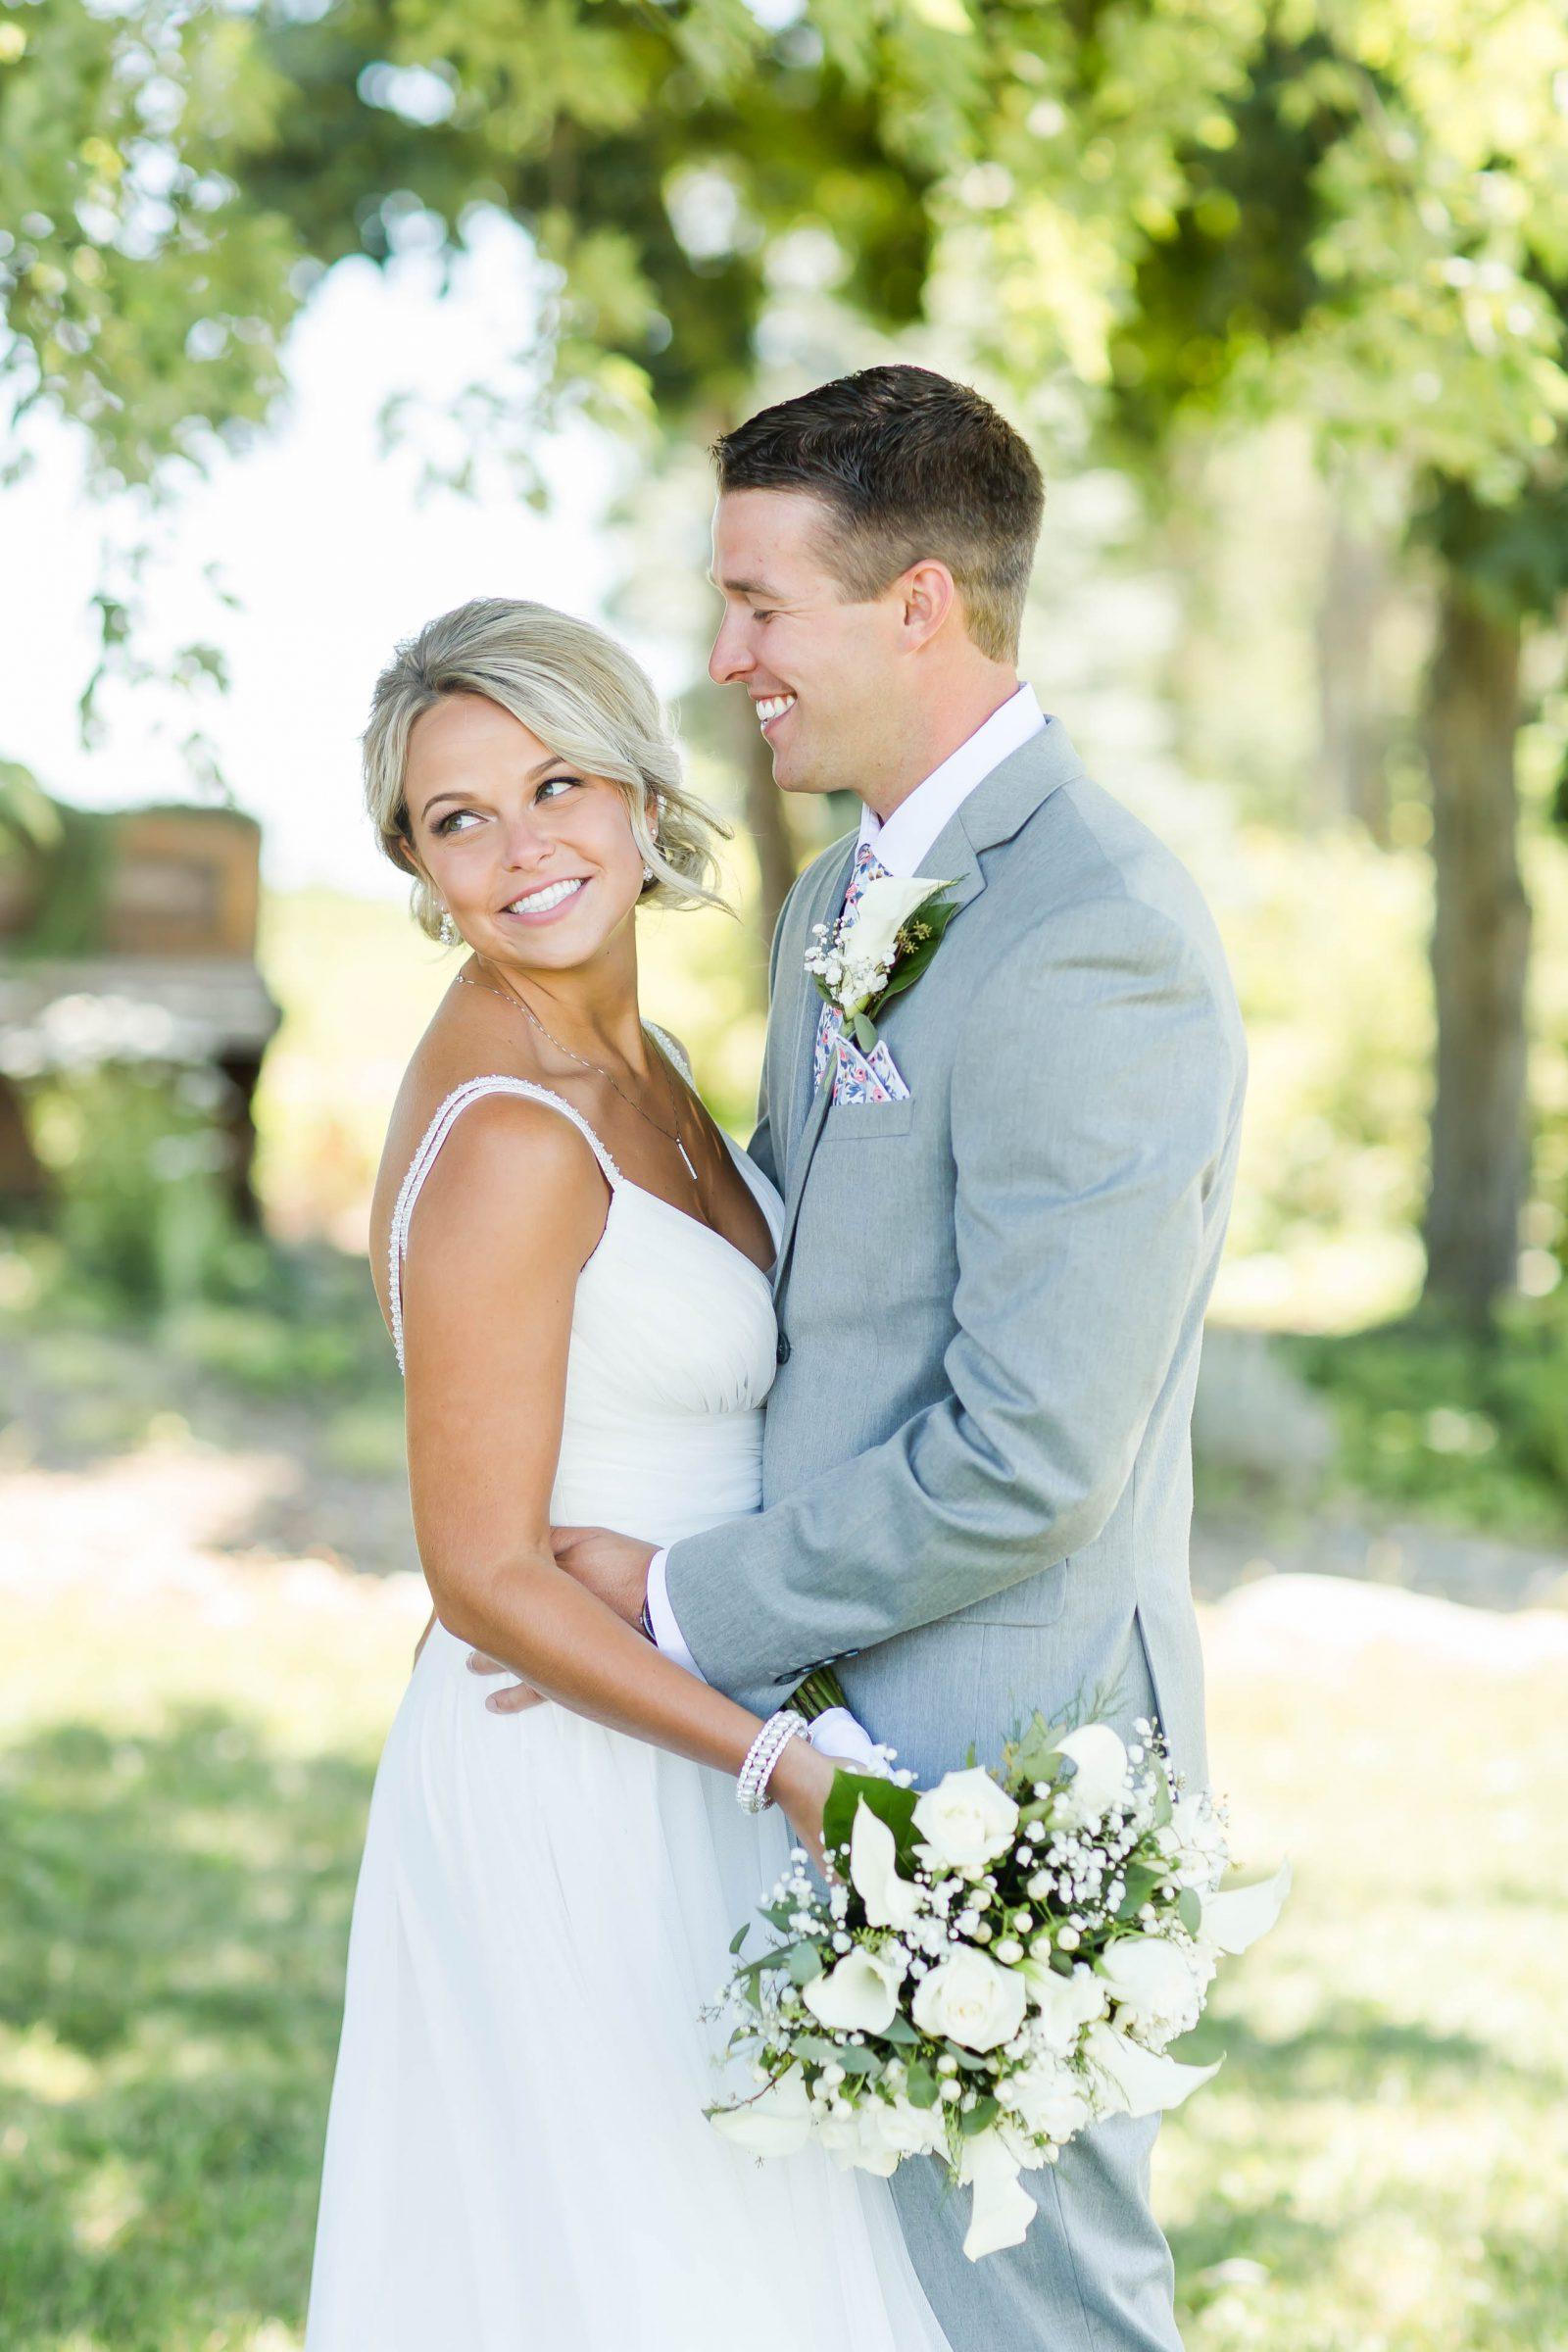 peacock-ridge-summer-wedding-photographer-akron-ohio-loren-jackson-photography-41